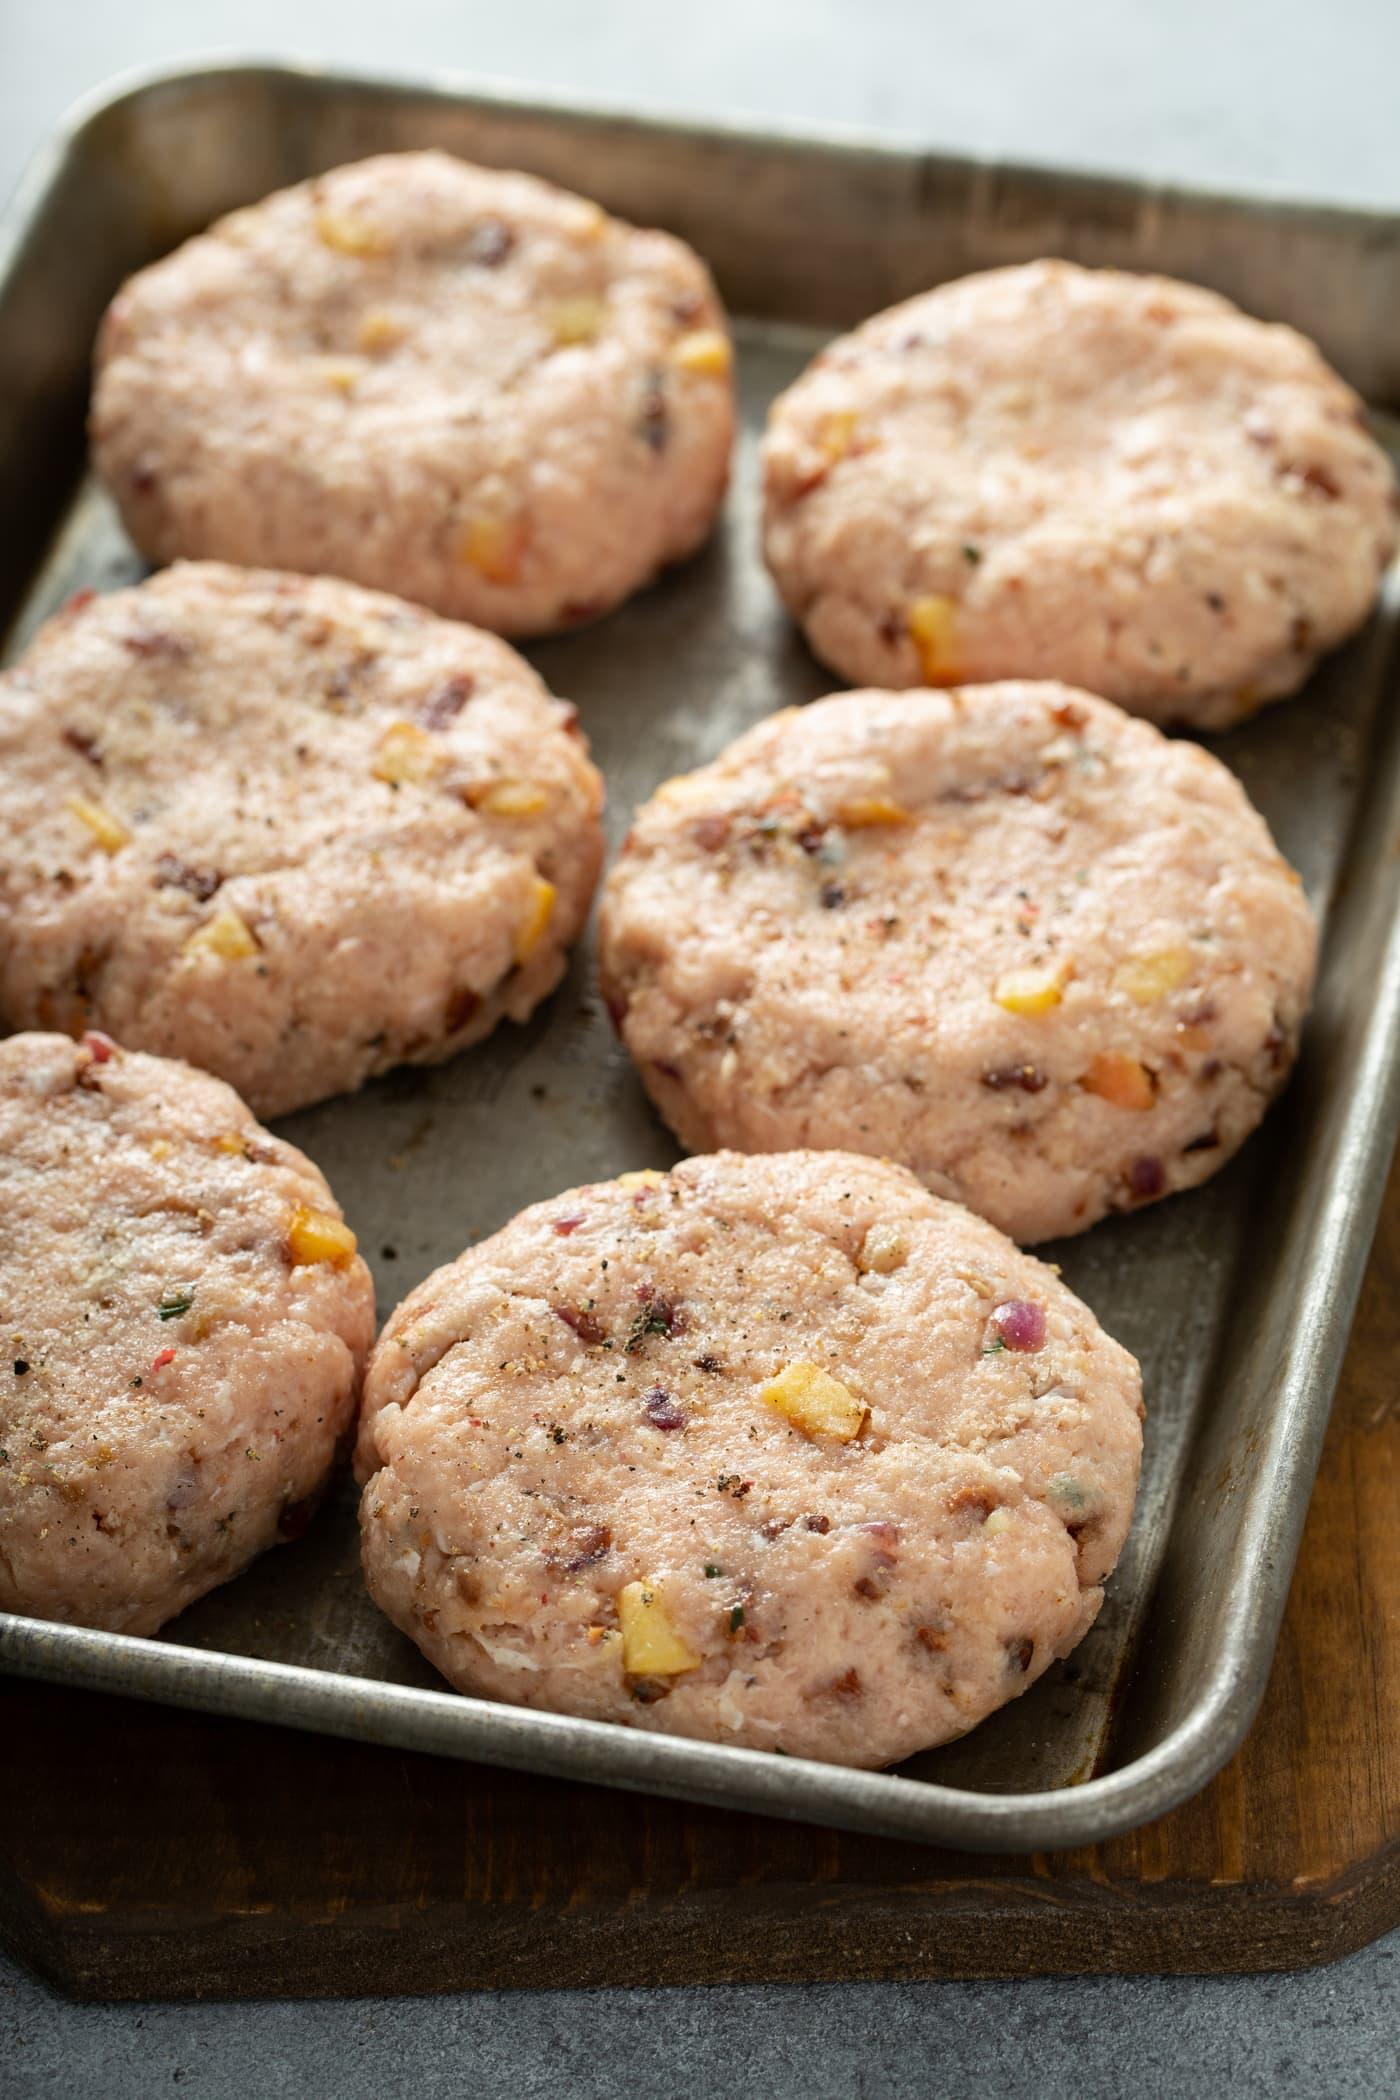 6 chicken burger patties on a baking pan.